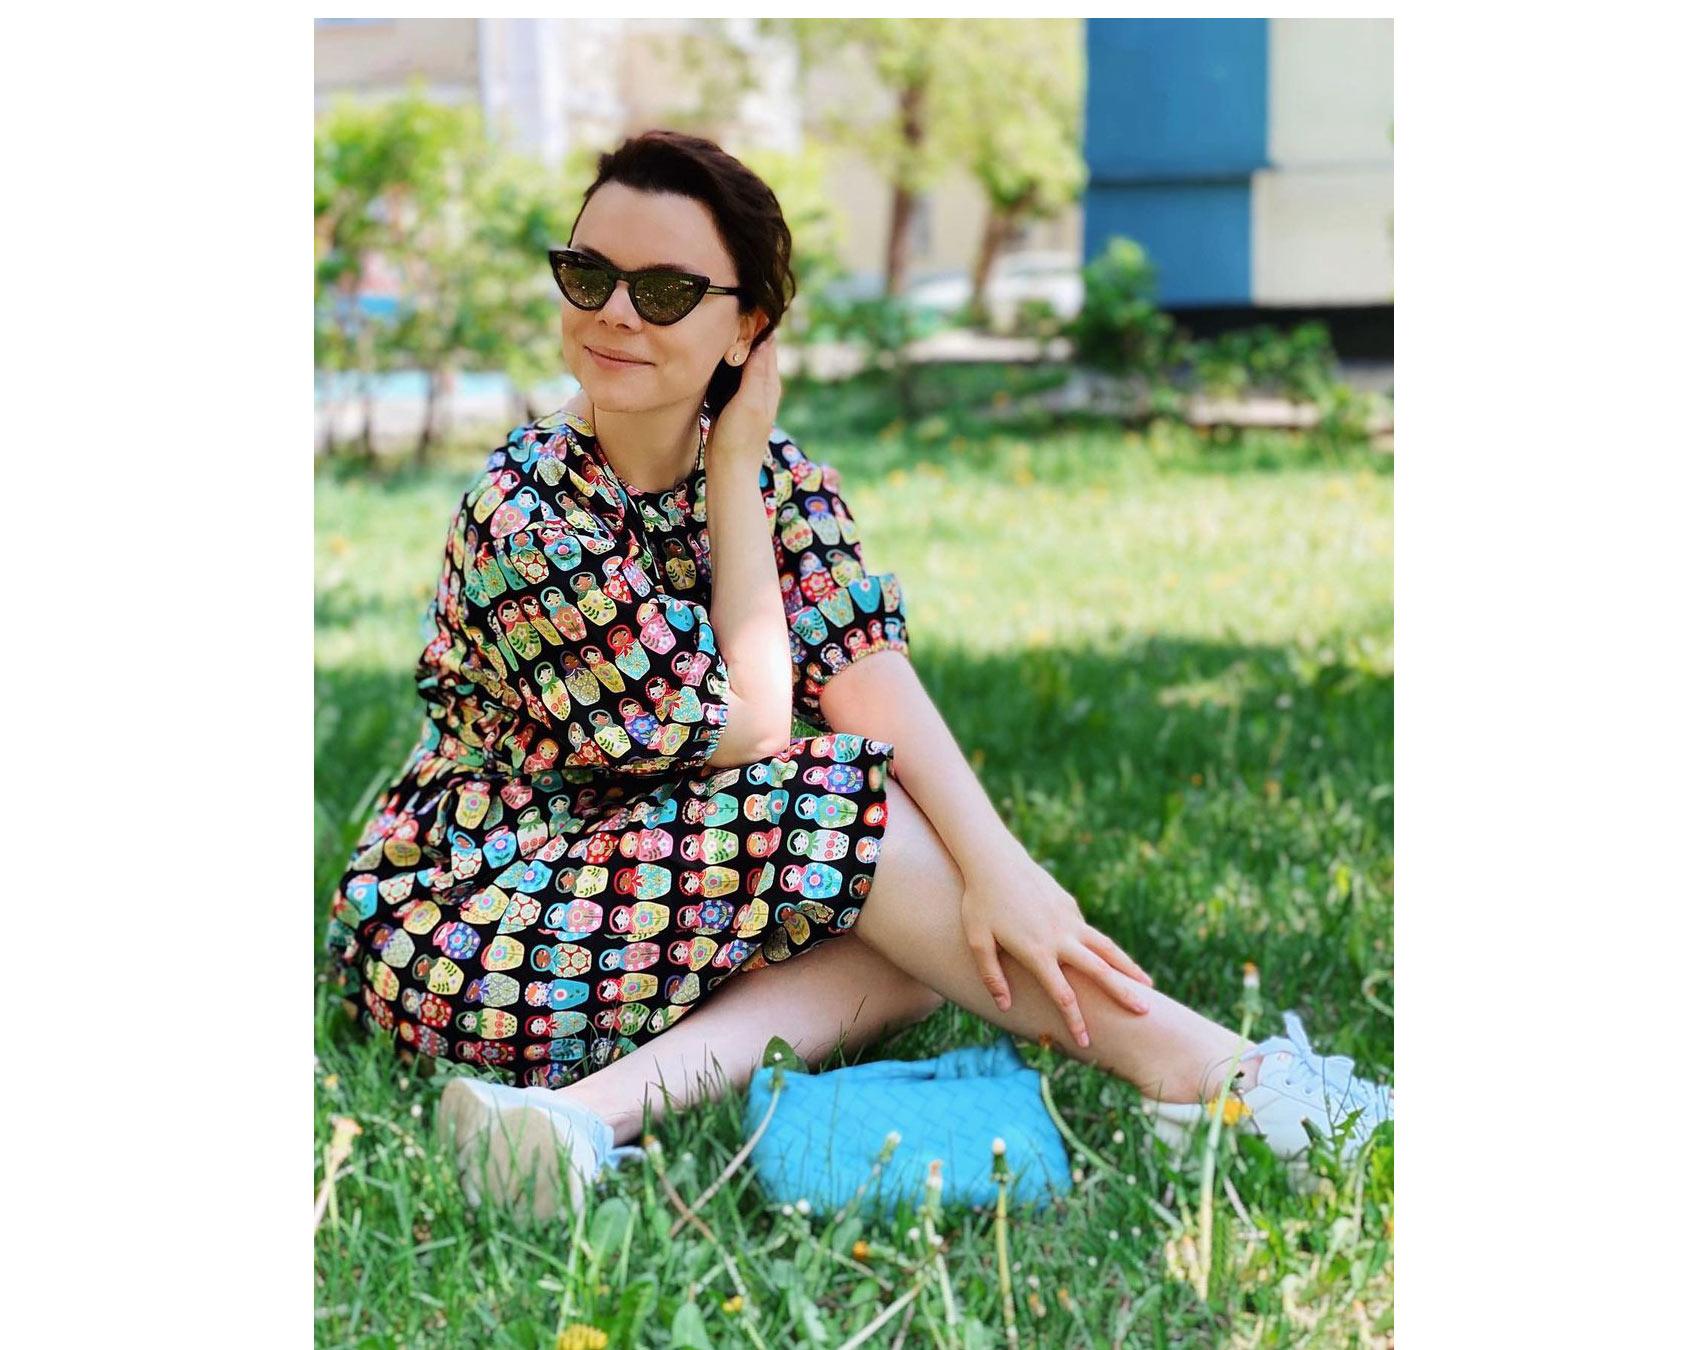 Татьяна Брухунова. Фото © instagram.com/bruhunova